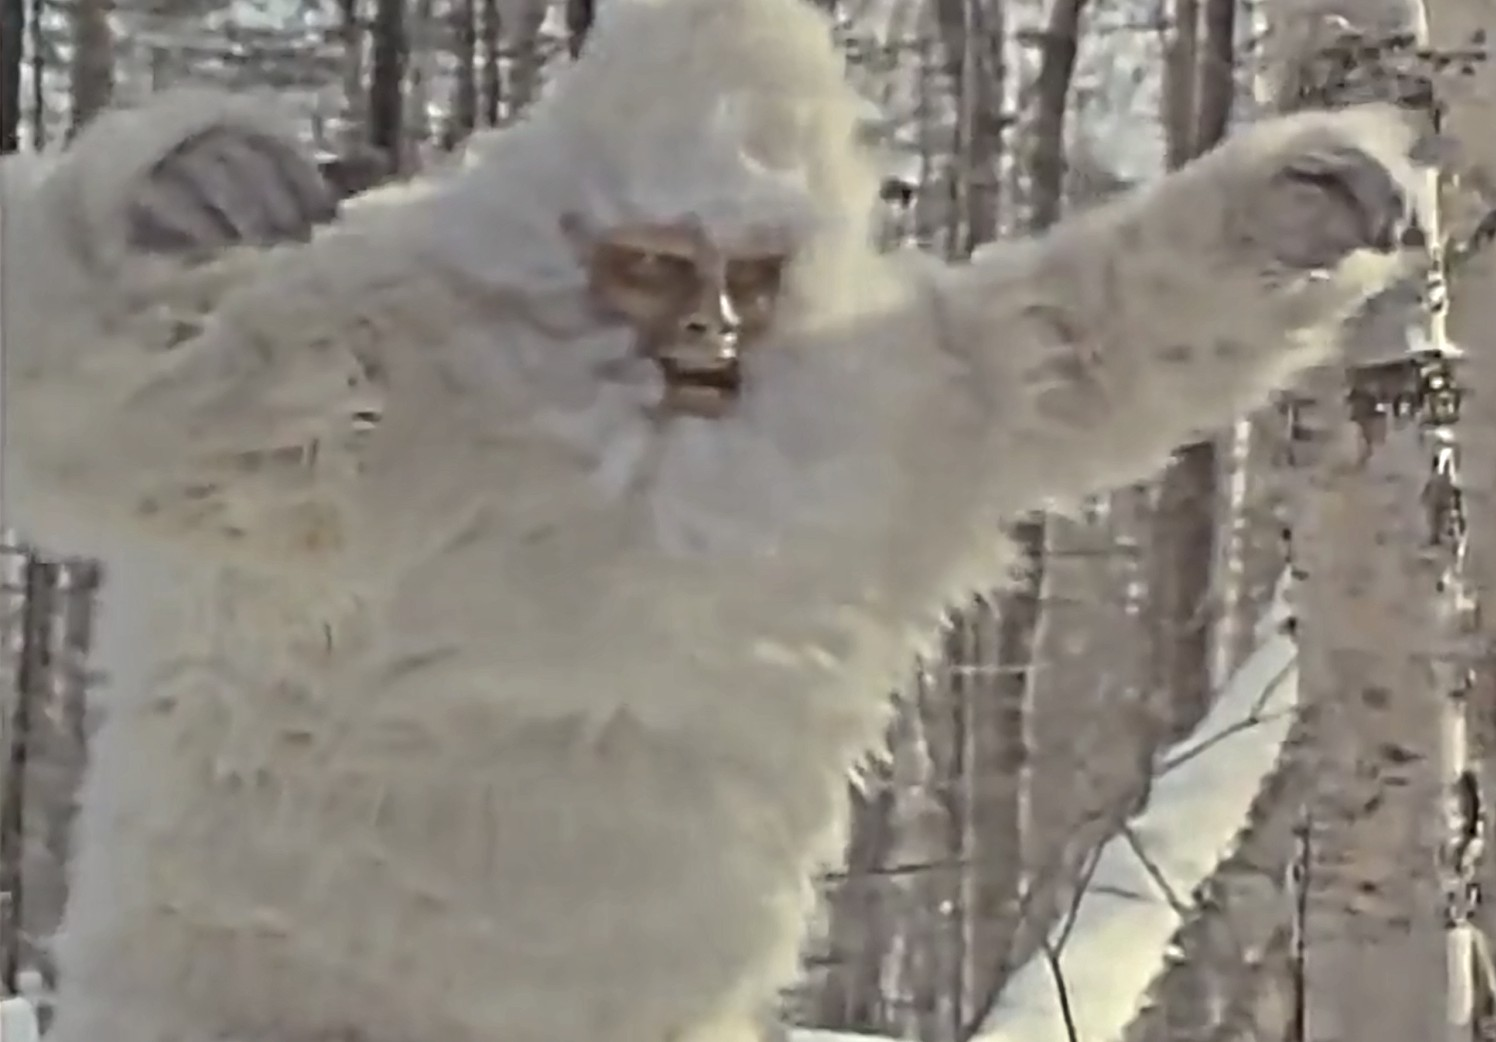 The Bigfoot in The Capture of Bigfoot (1979)